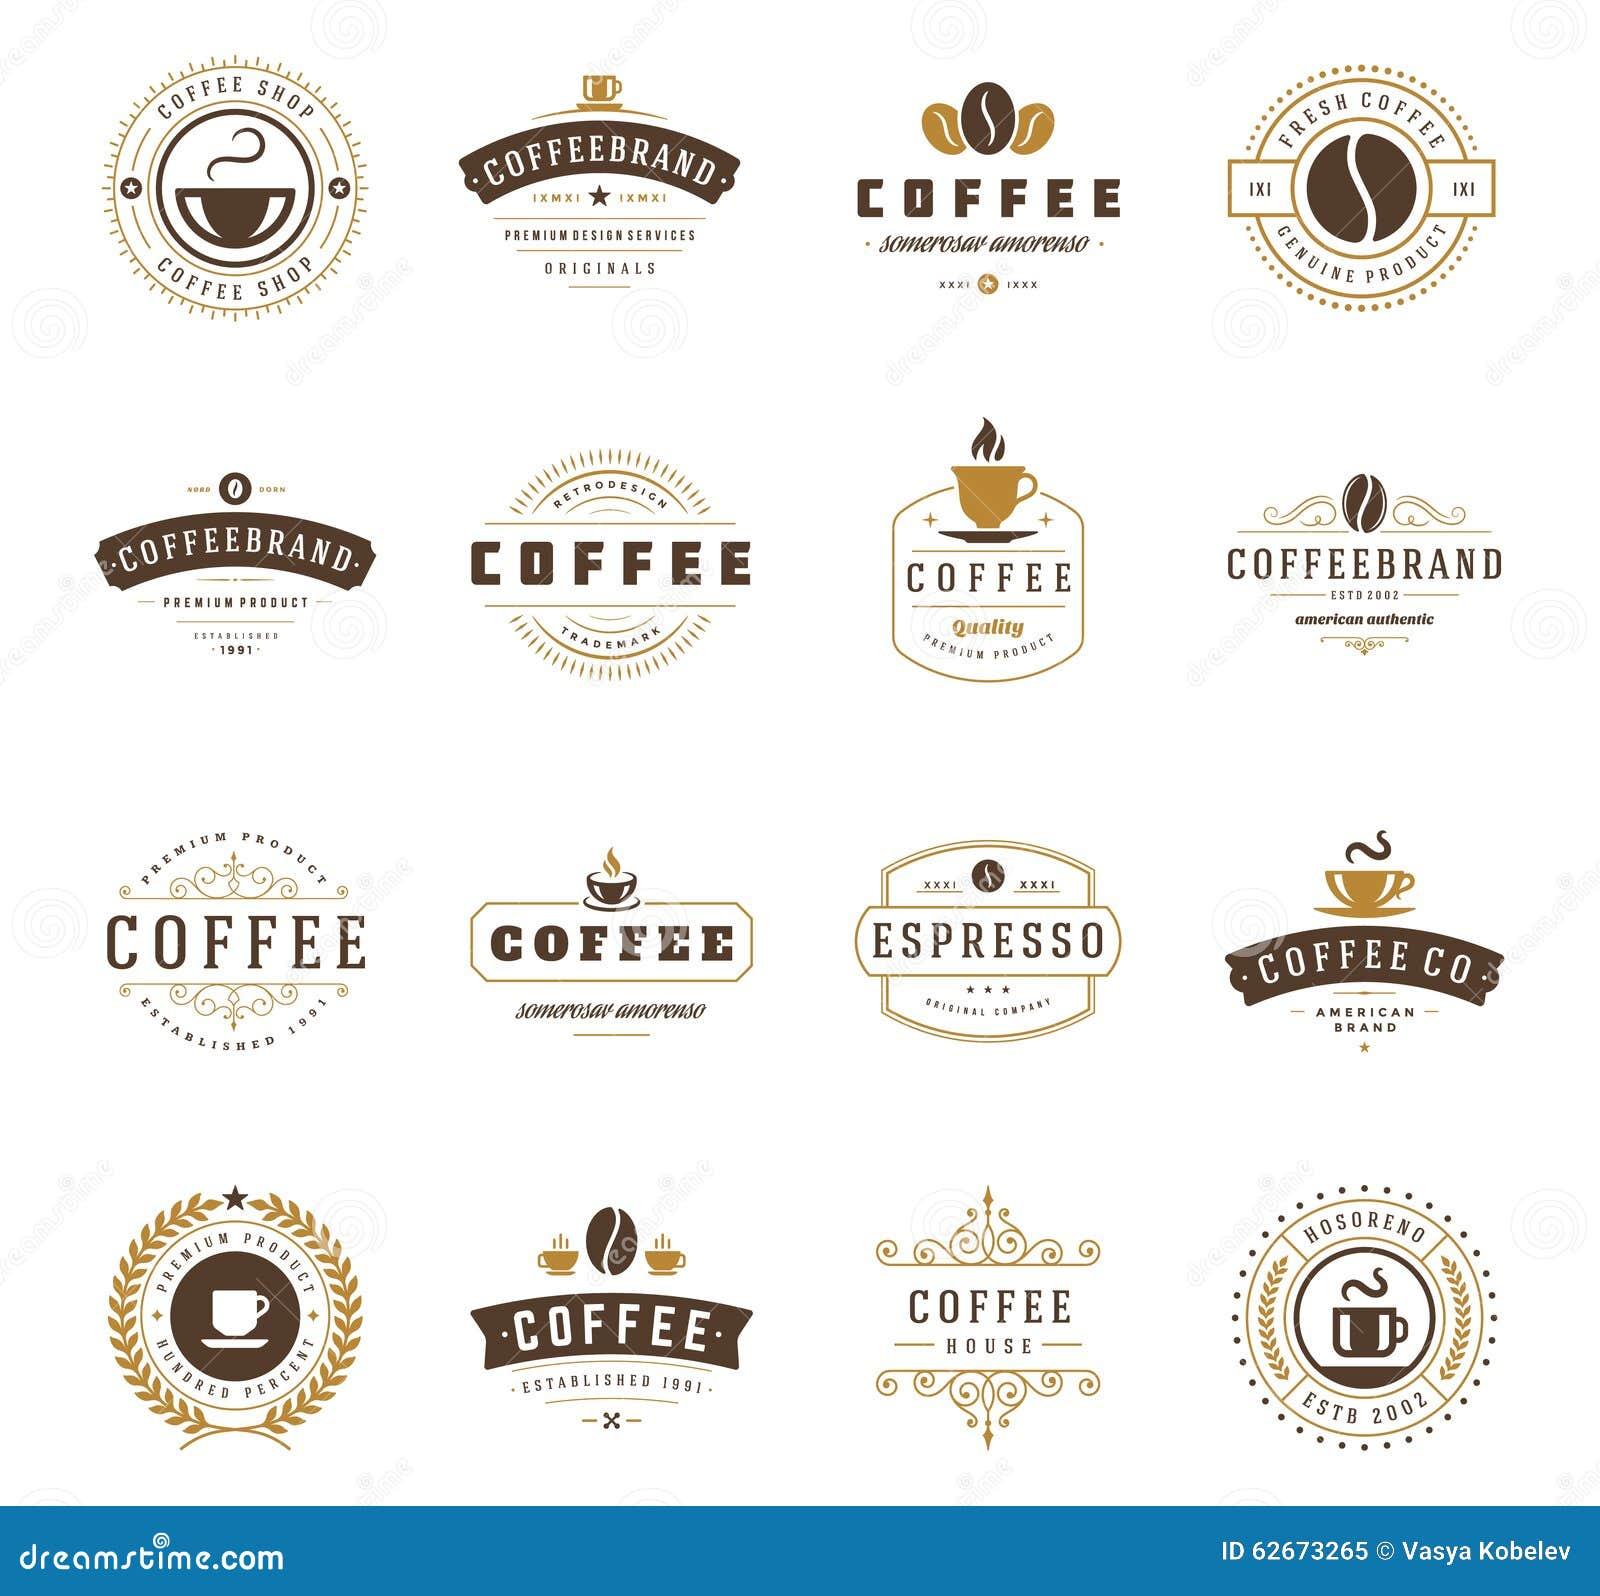 Art logo logo s coffee logo coffee shop coffee design shop logo coffee - Cafe Coffee Cup Design Illustration Retro Set Shop